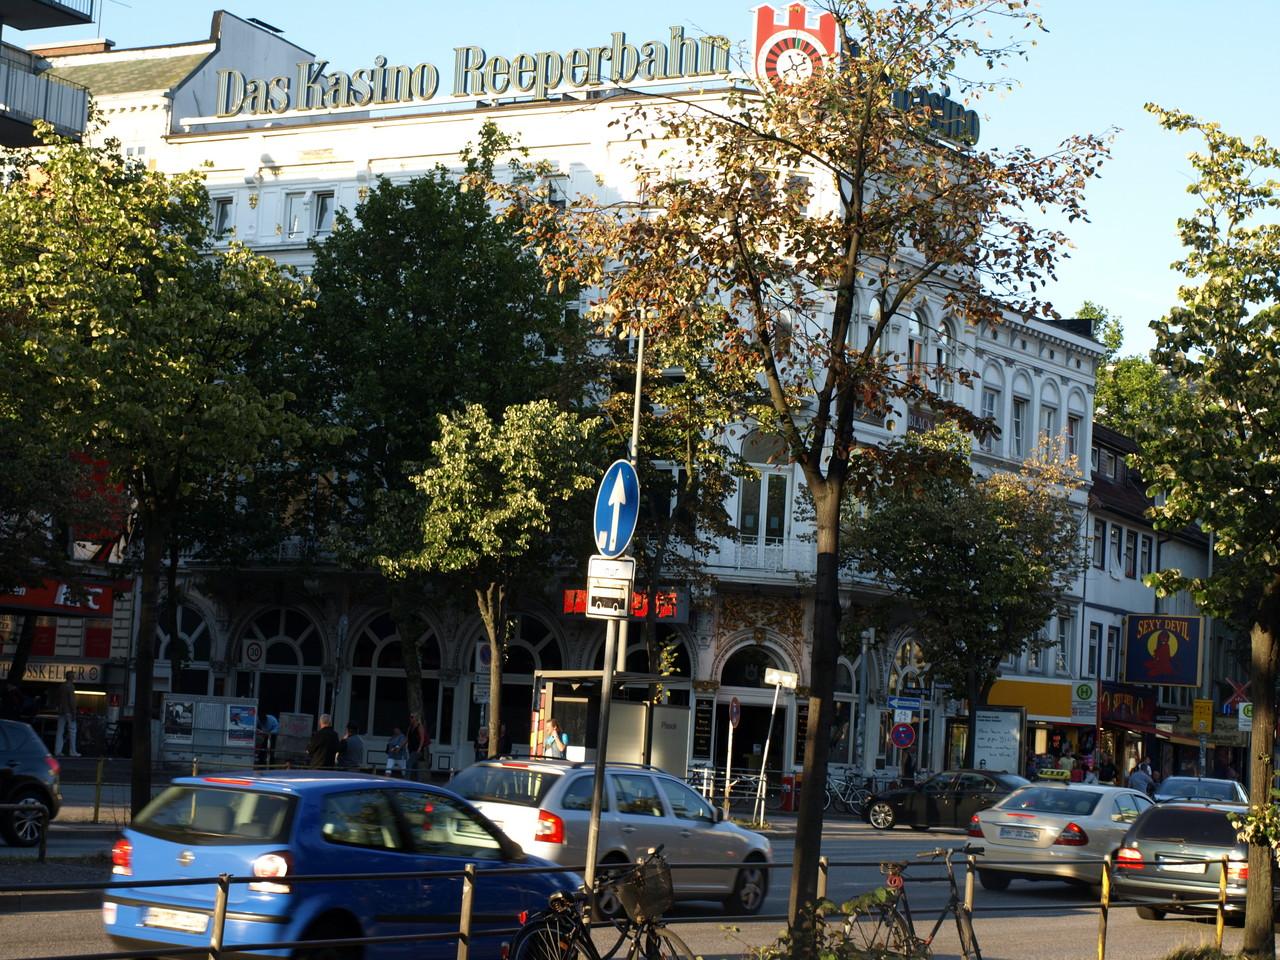 Reperbahn